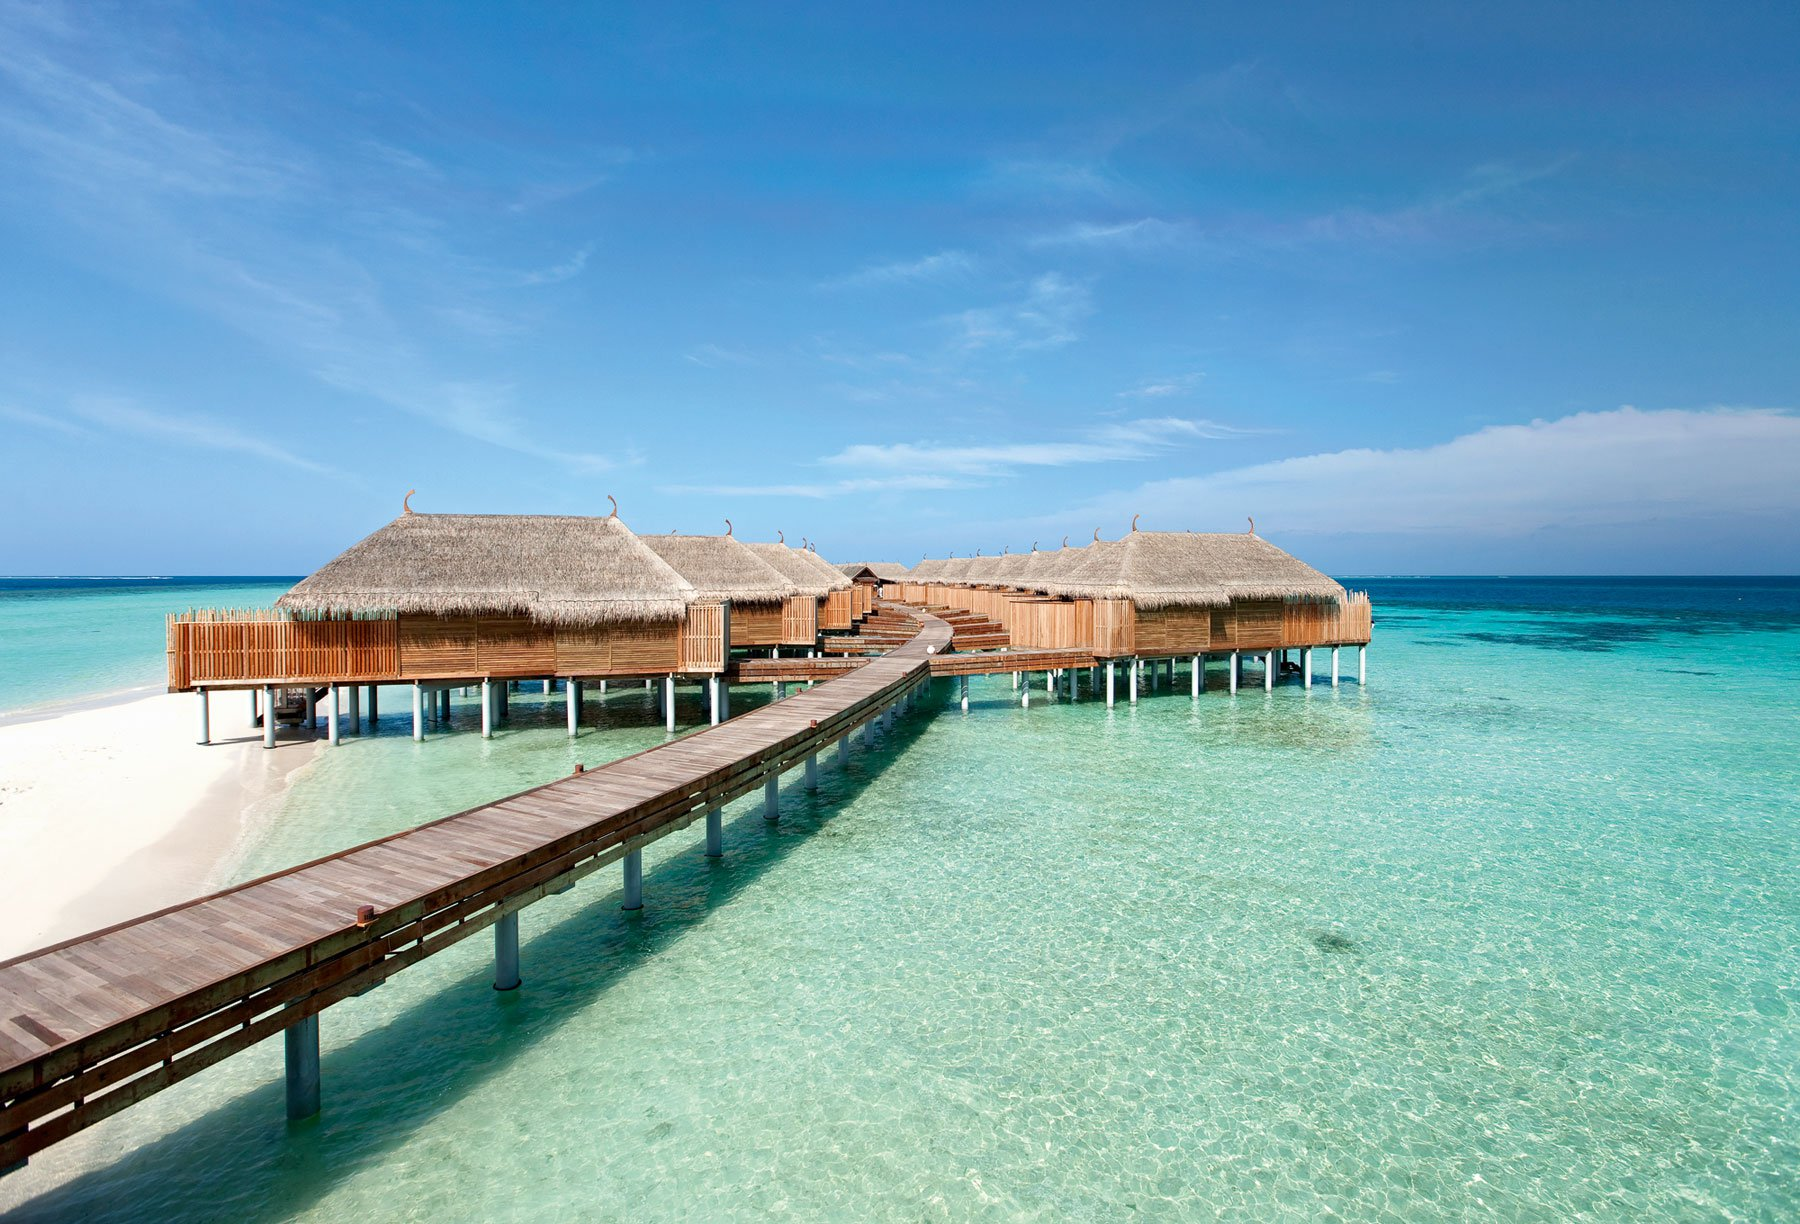 Constance-Moofushi-Maldives-09